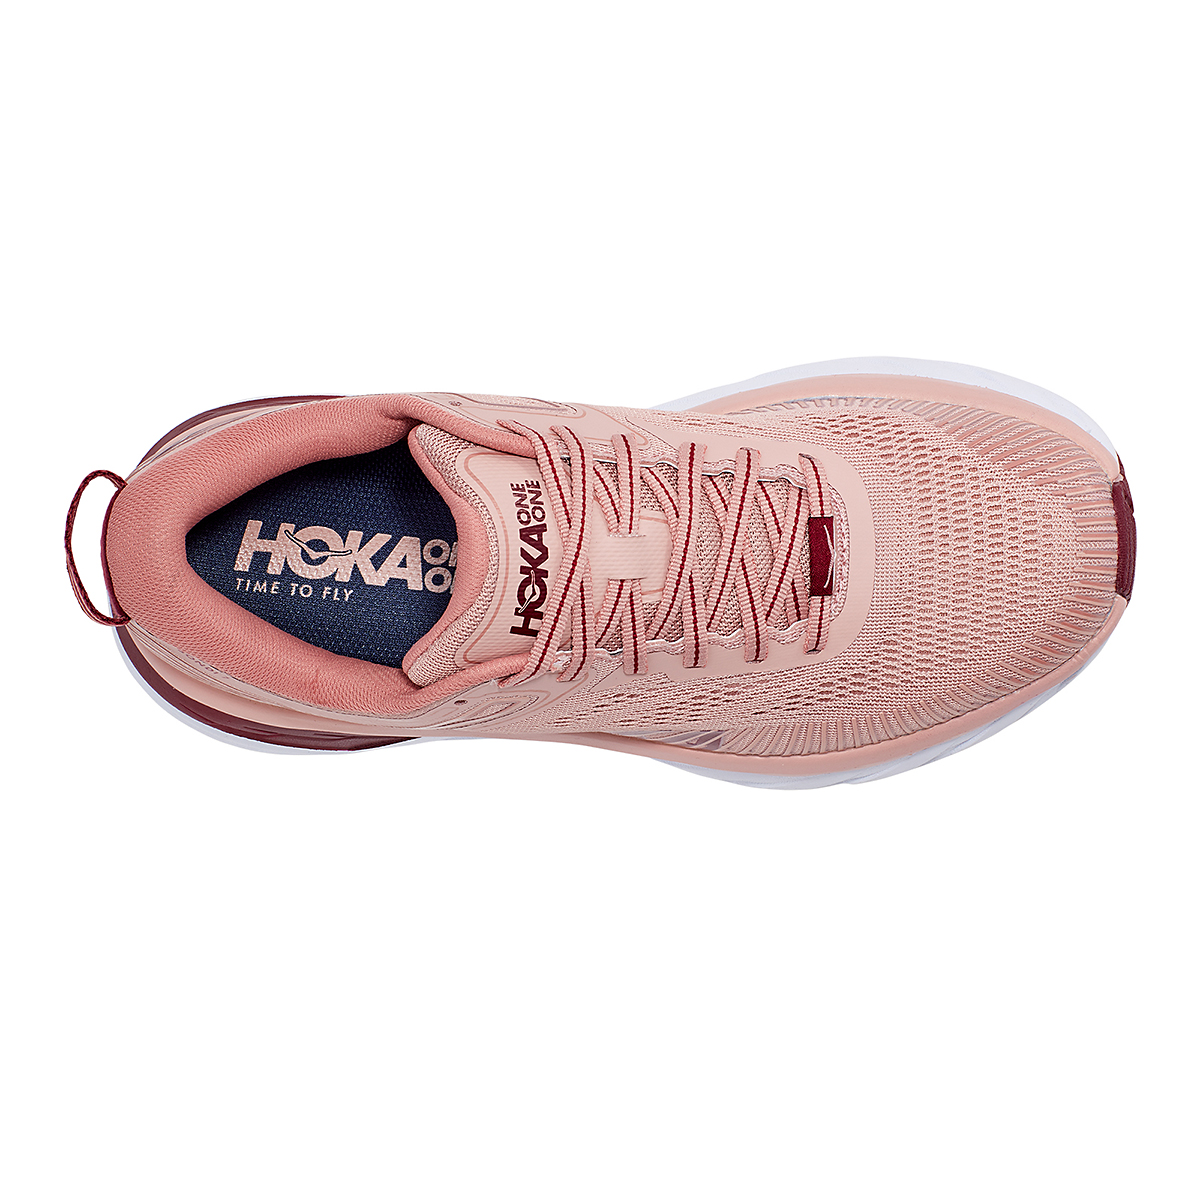 Women's Hoka One One Bondi 7 Running Shoe - Color: Misty Rose/Cordovan - Size: 5 - Width: Regular, Misty Rose/Cordovan, large, image 7